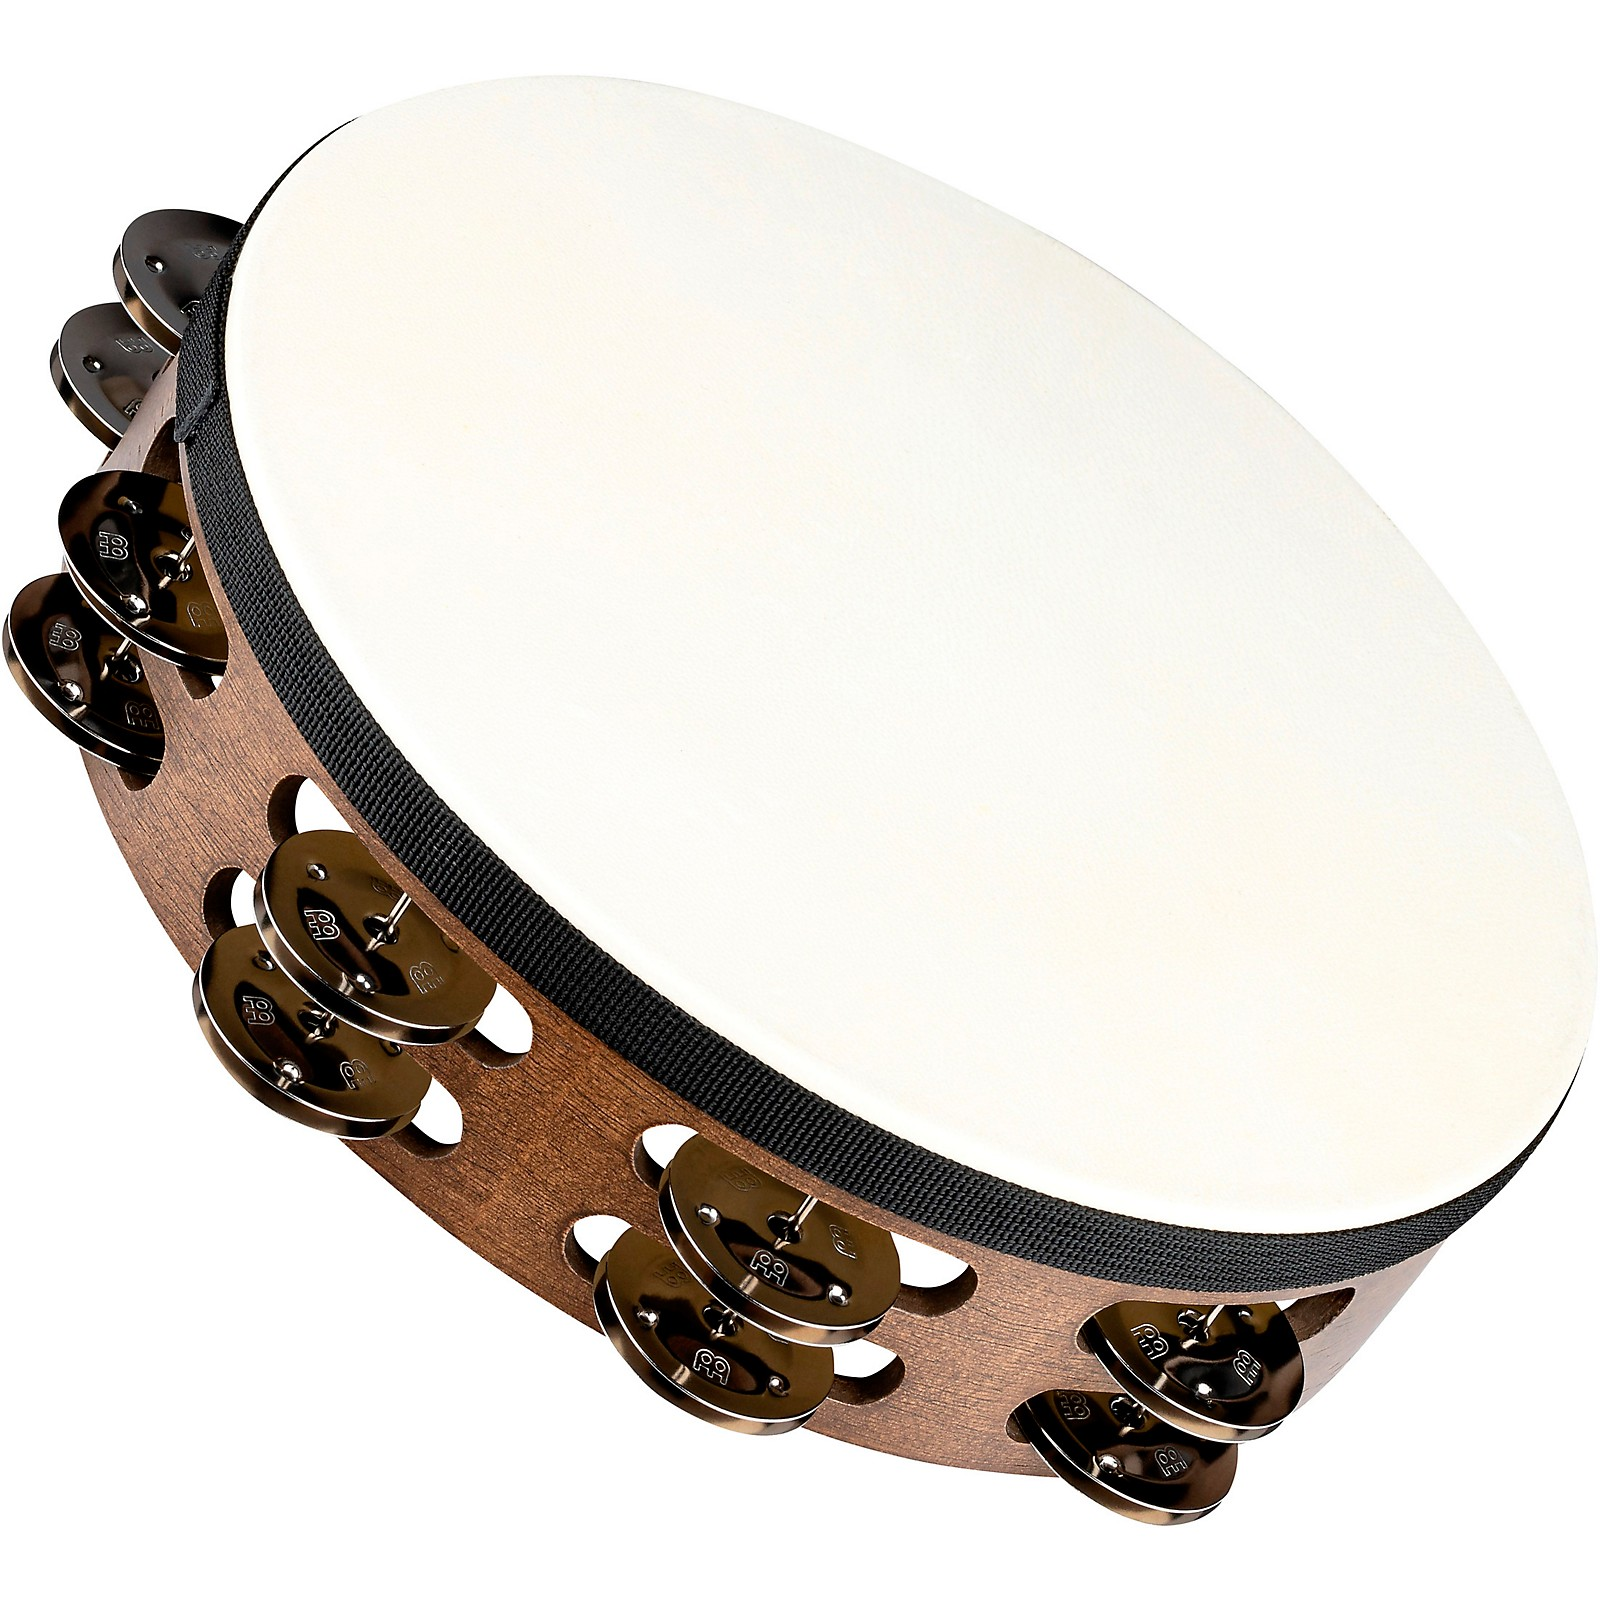 Meinl Headed Wood Tambourine with Double Row Steel Jingles